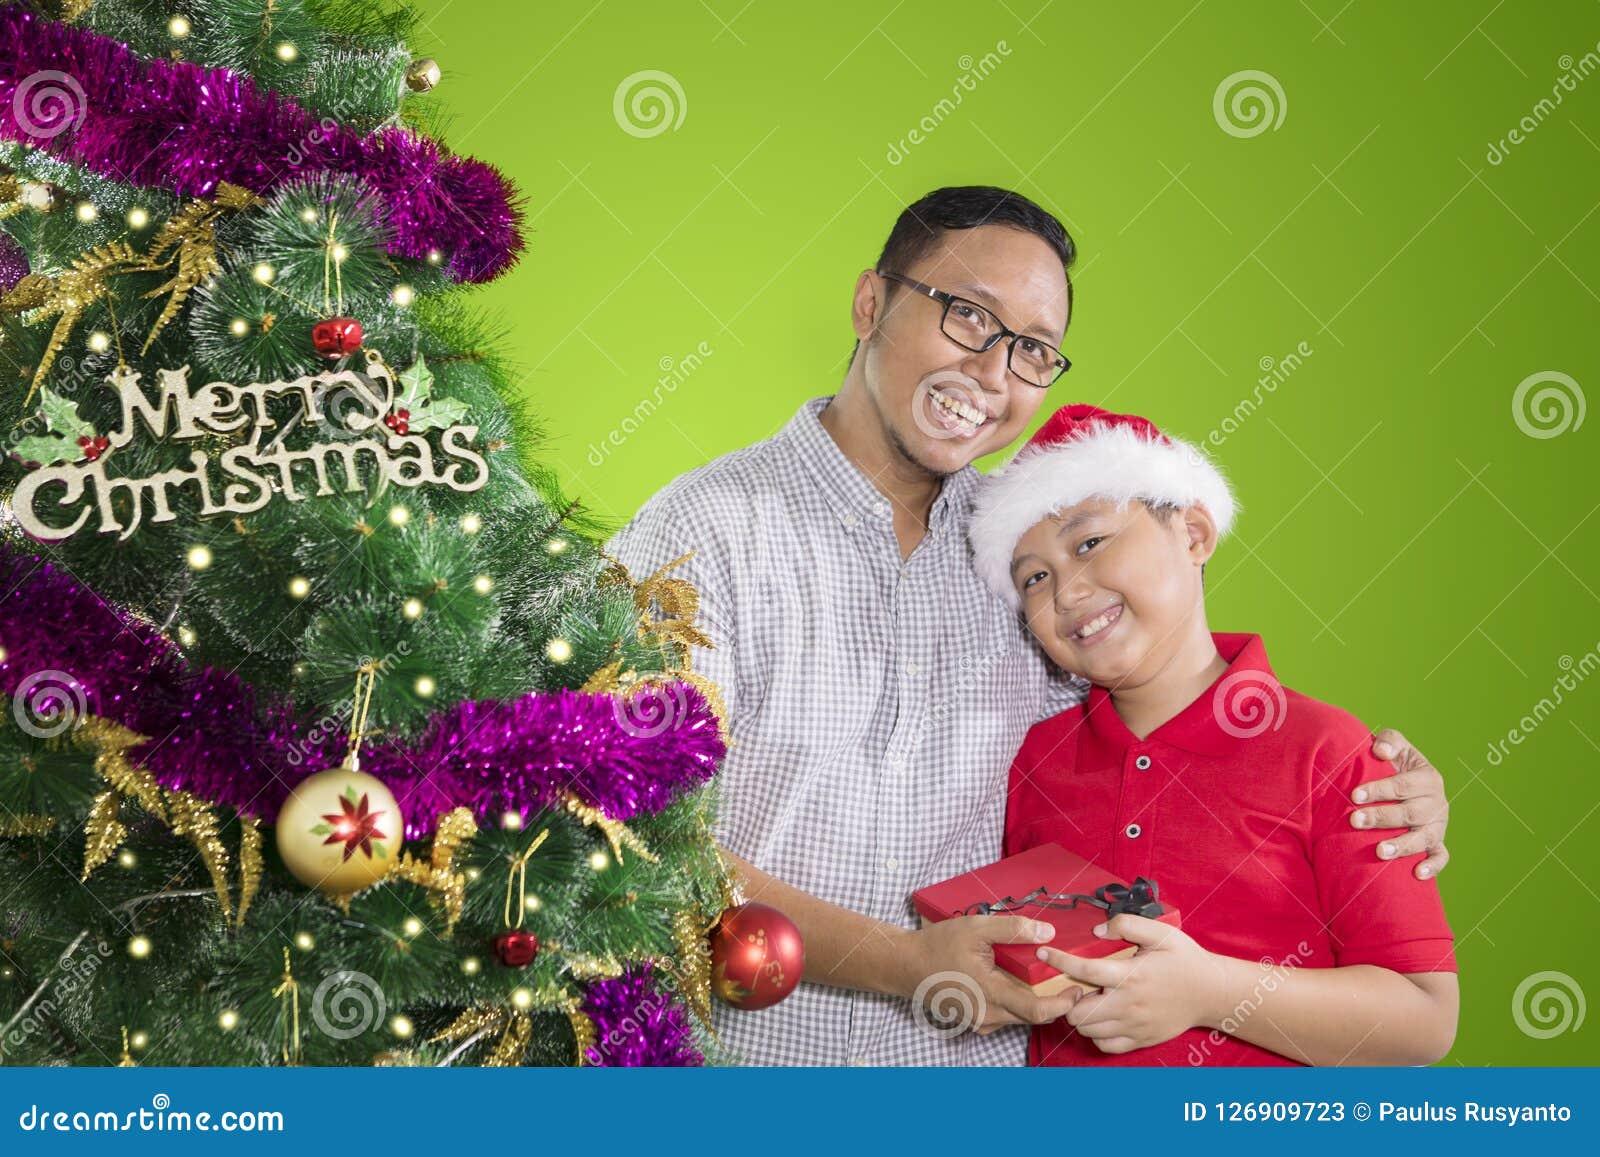 Father And Child Holding Christmas Gift Stock Image Image Of Present Christmas 126909723